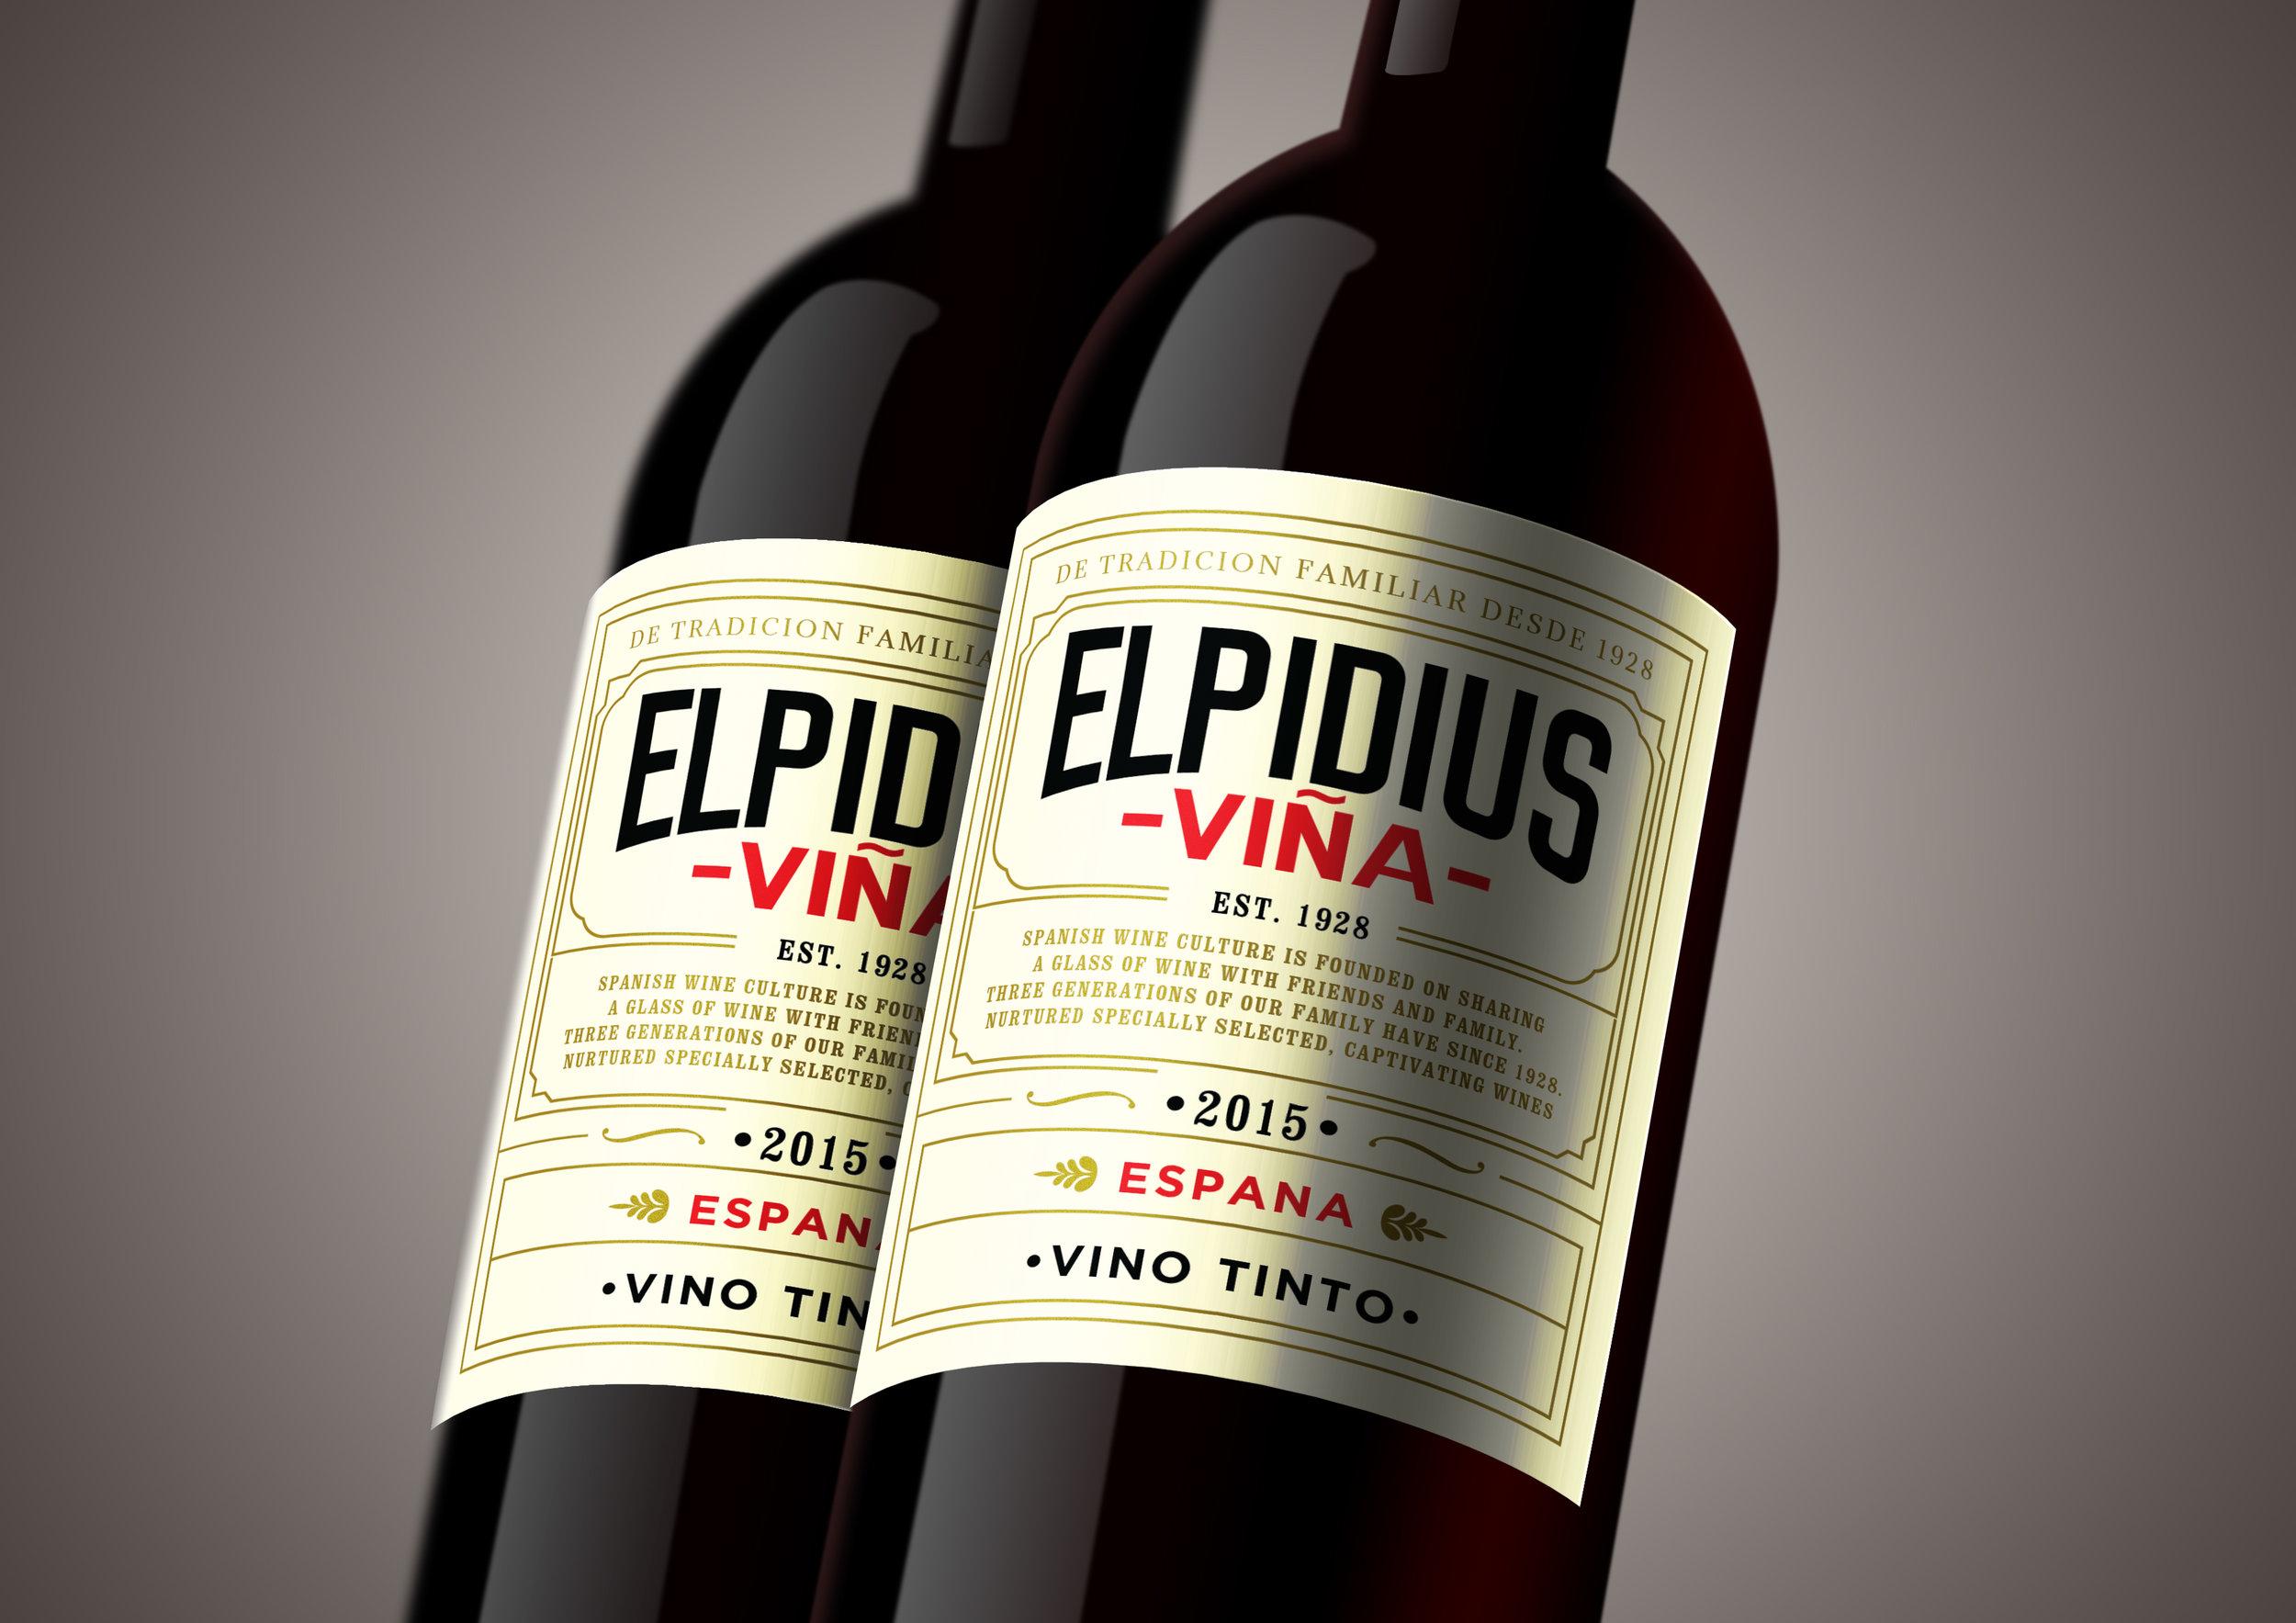 Elpidius 2 Bottle Shot.jpg